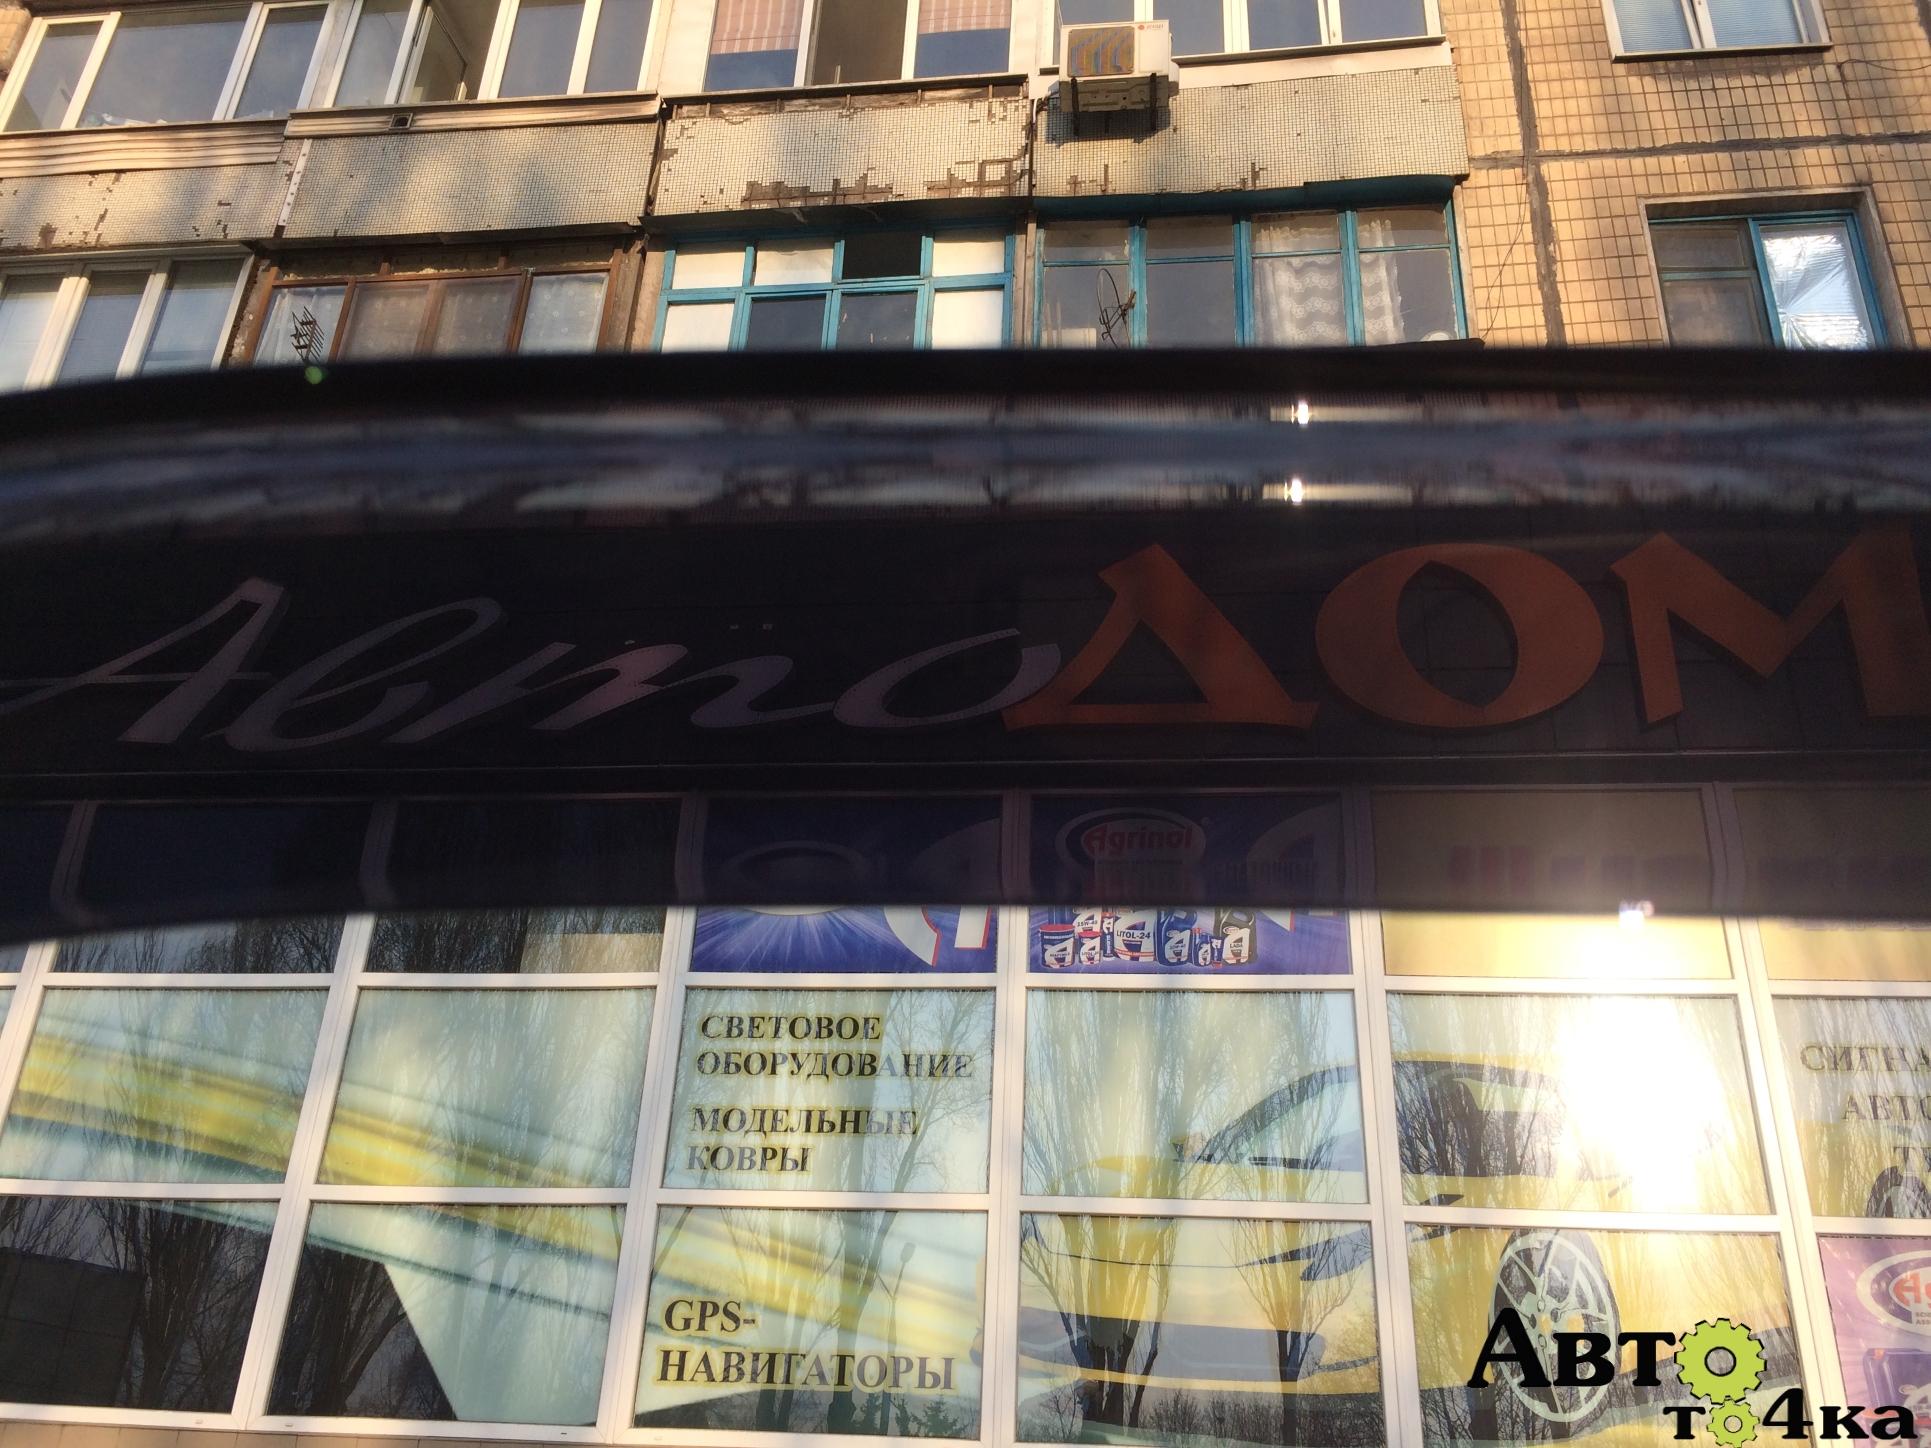 Ветровики «Voron Glass»